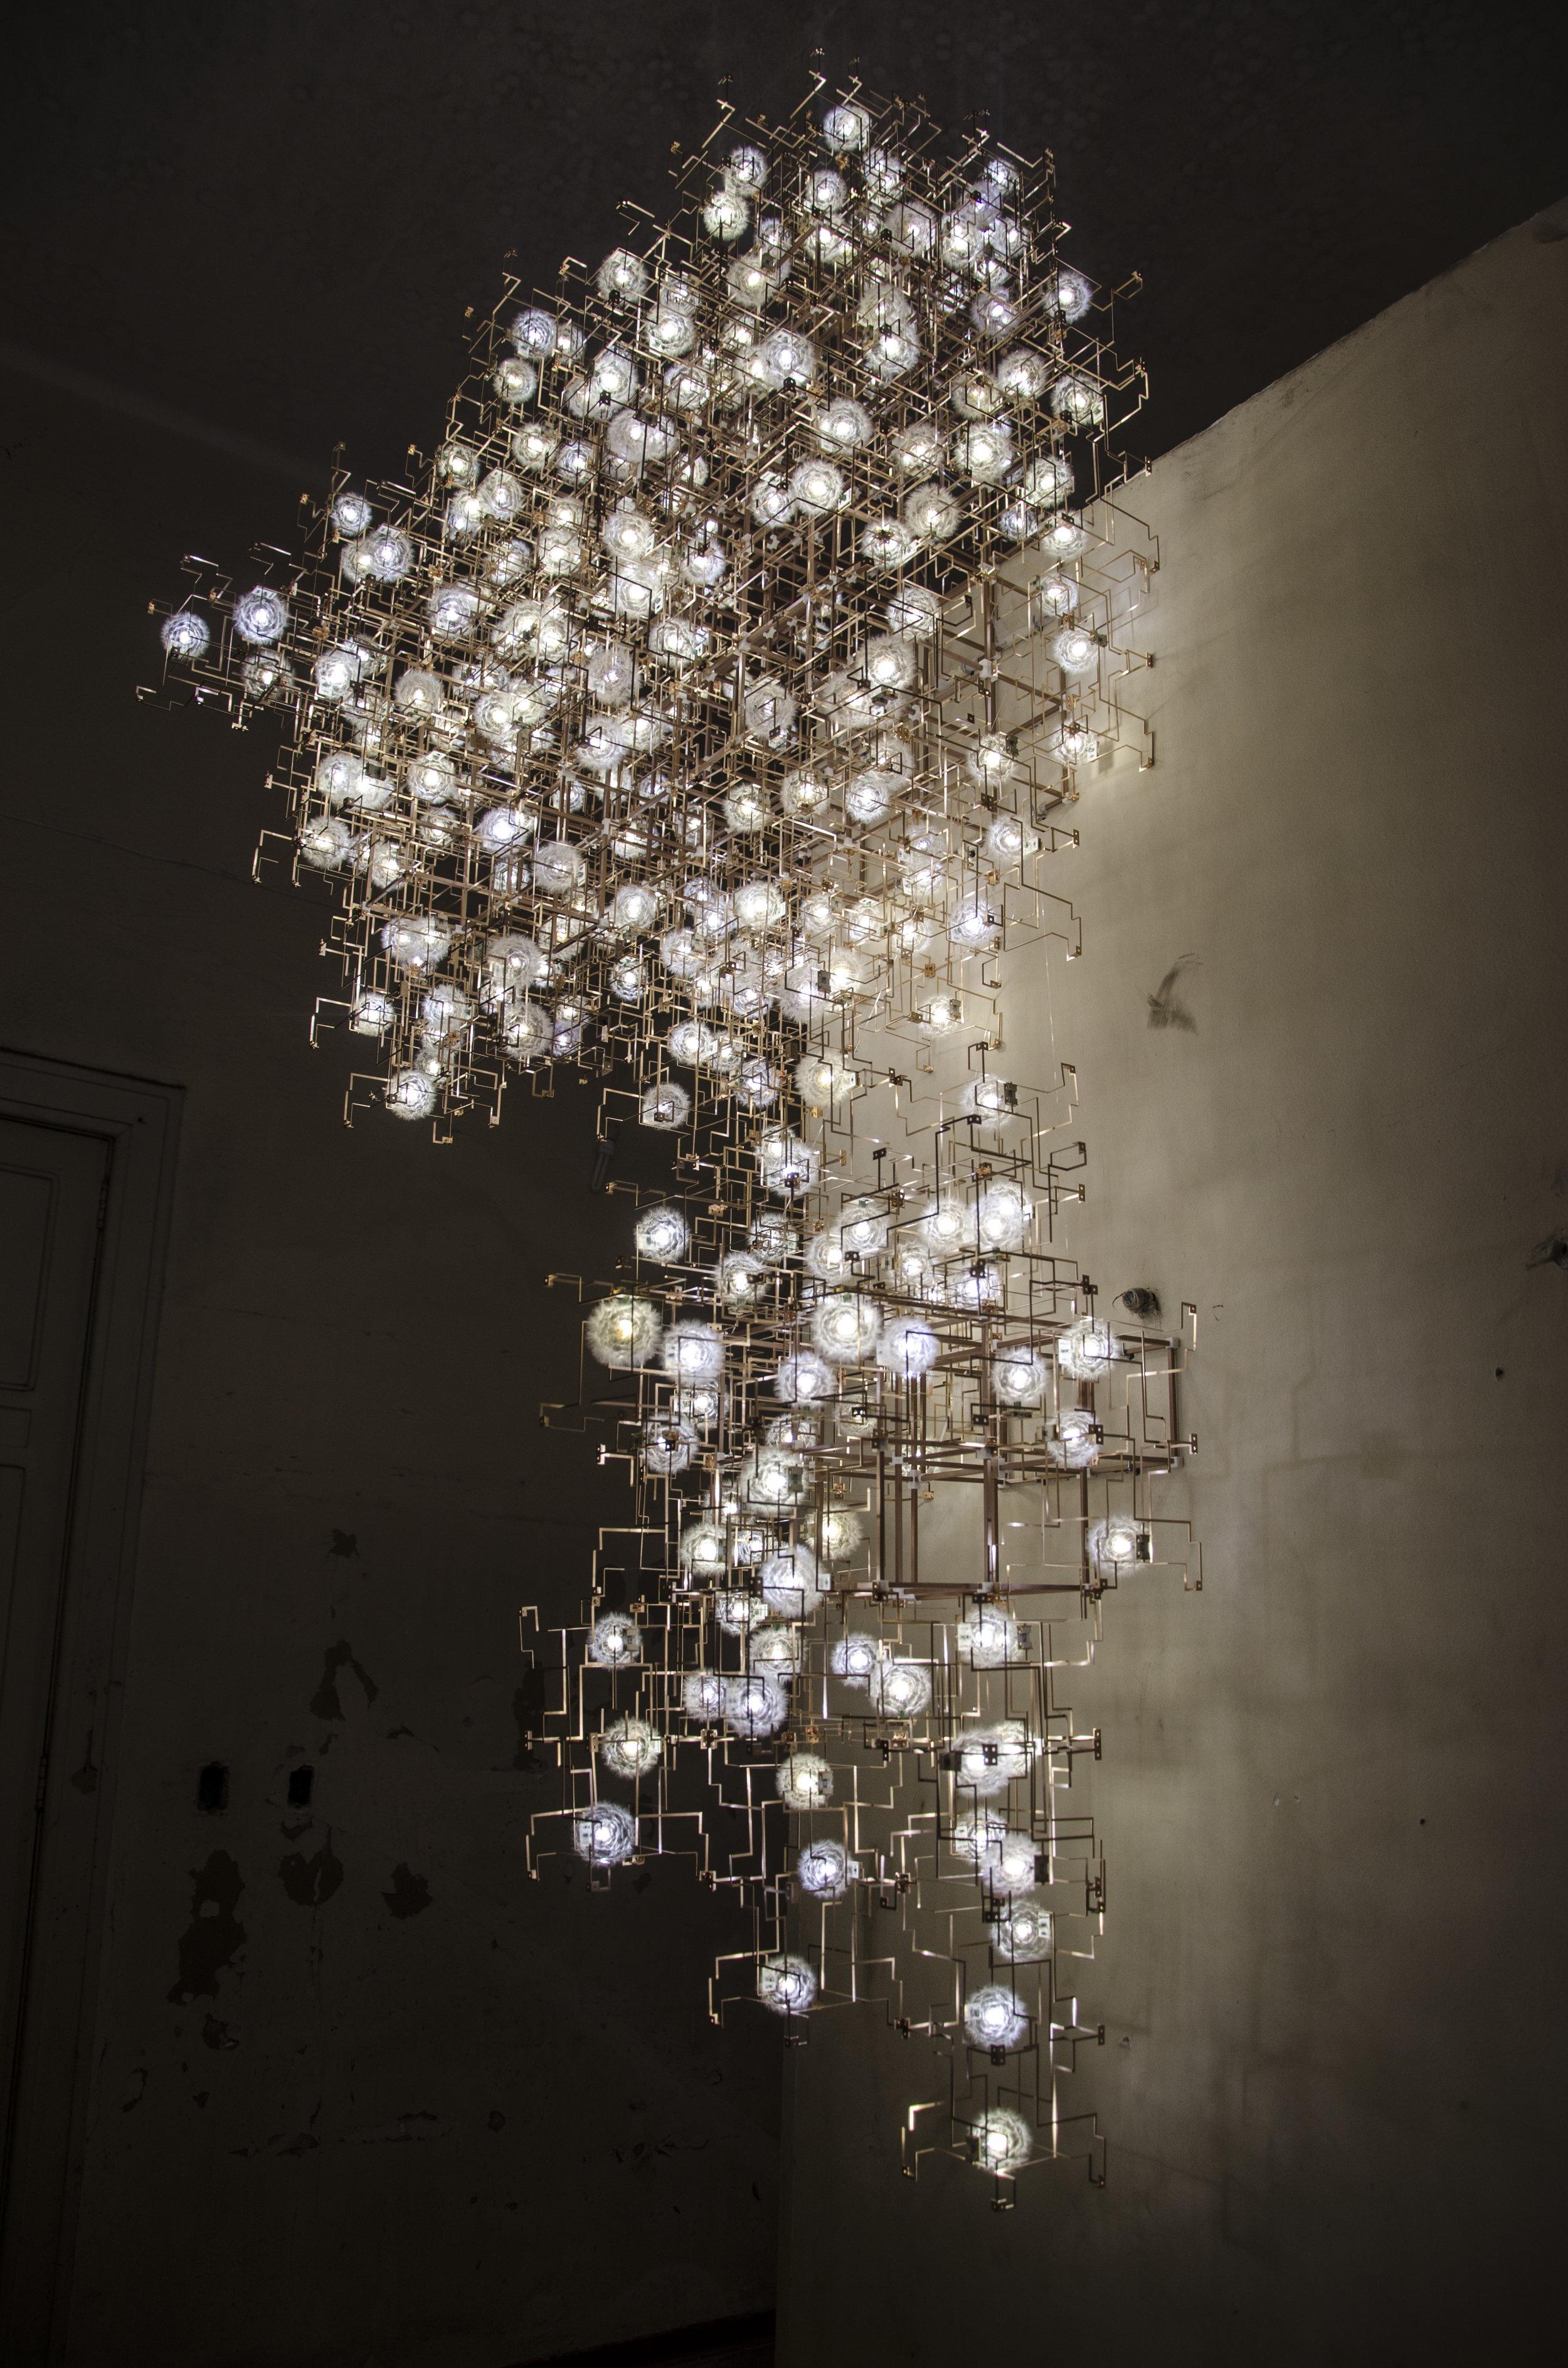 Studio Drift Fragile Future at Cidade Matarazzo 2014